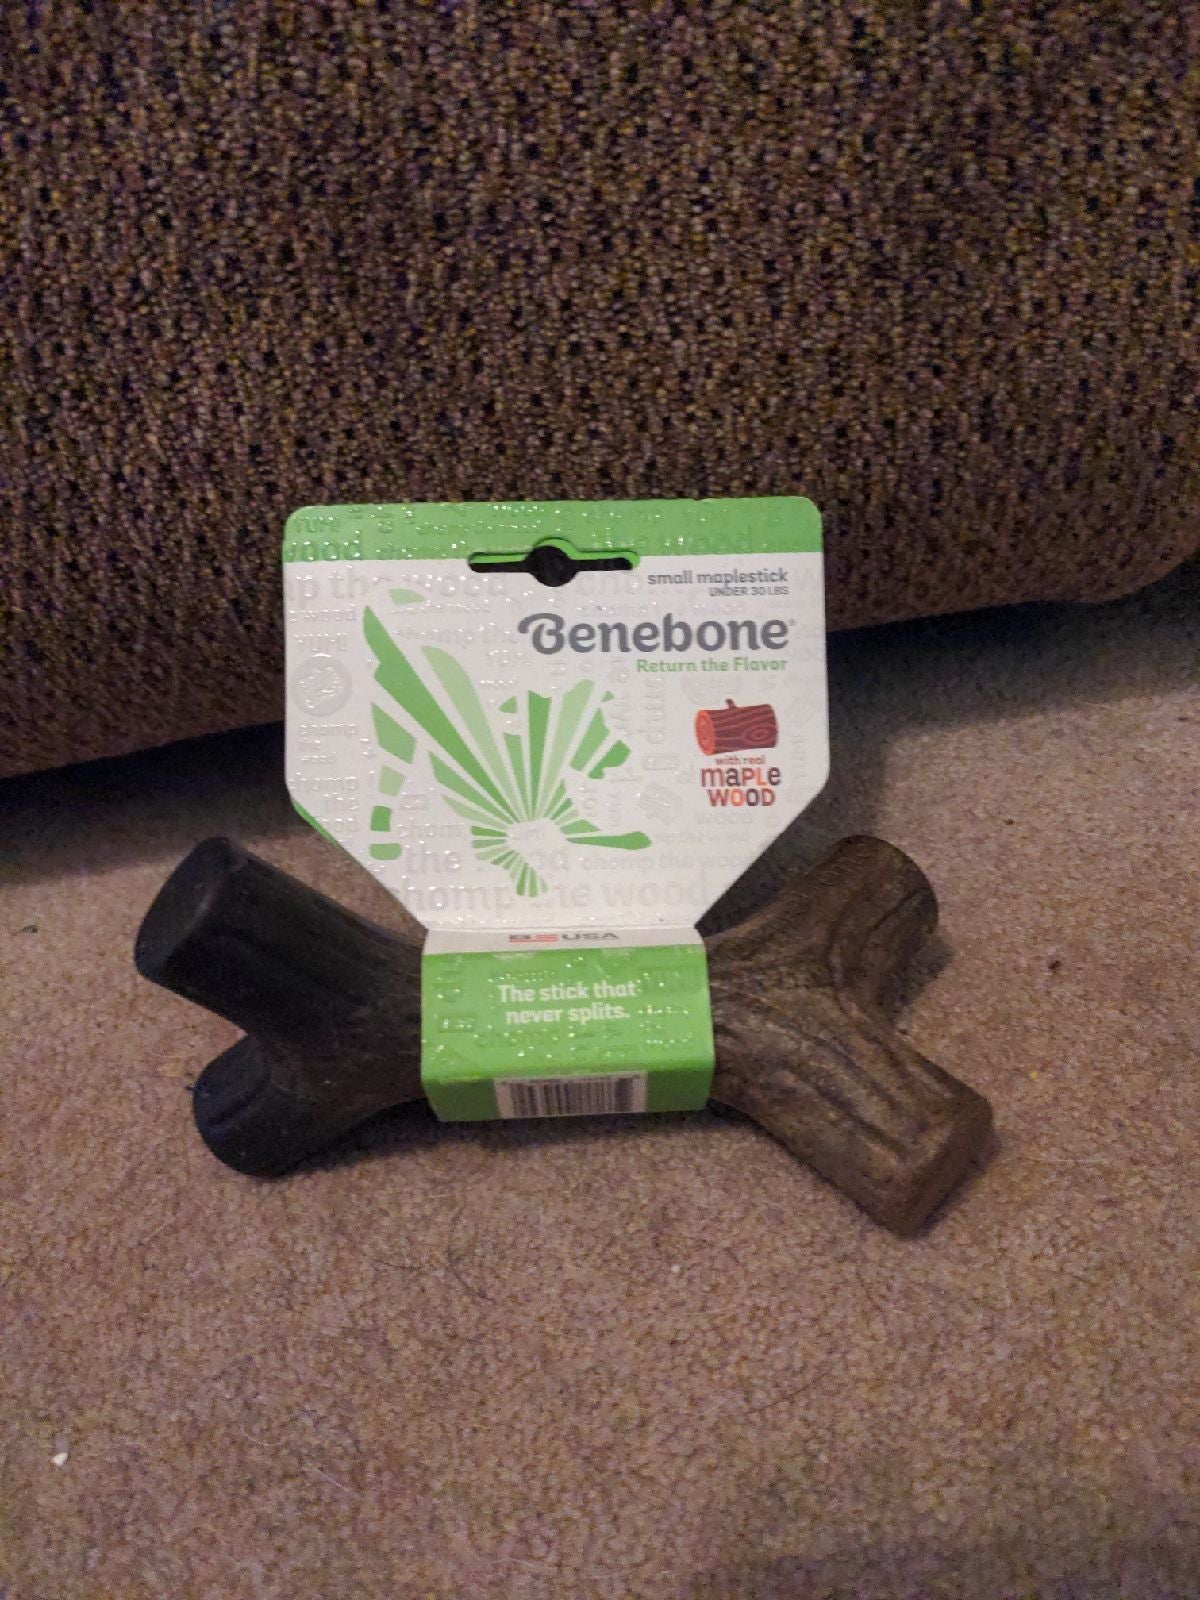 Maple wood benebone